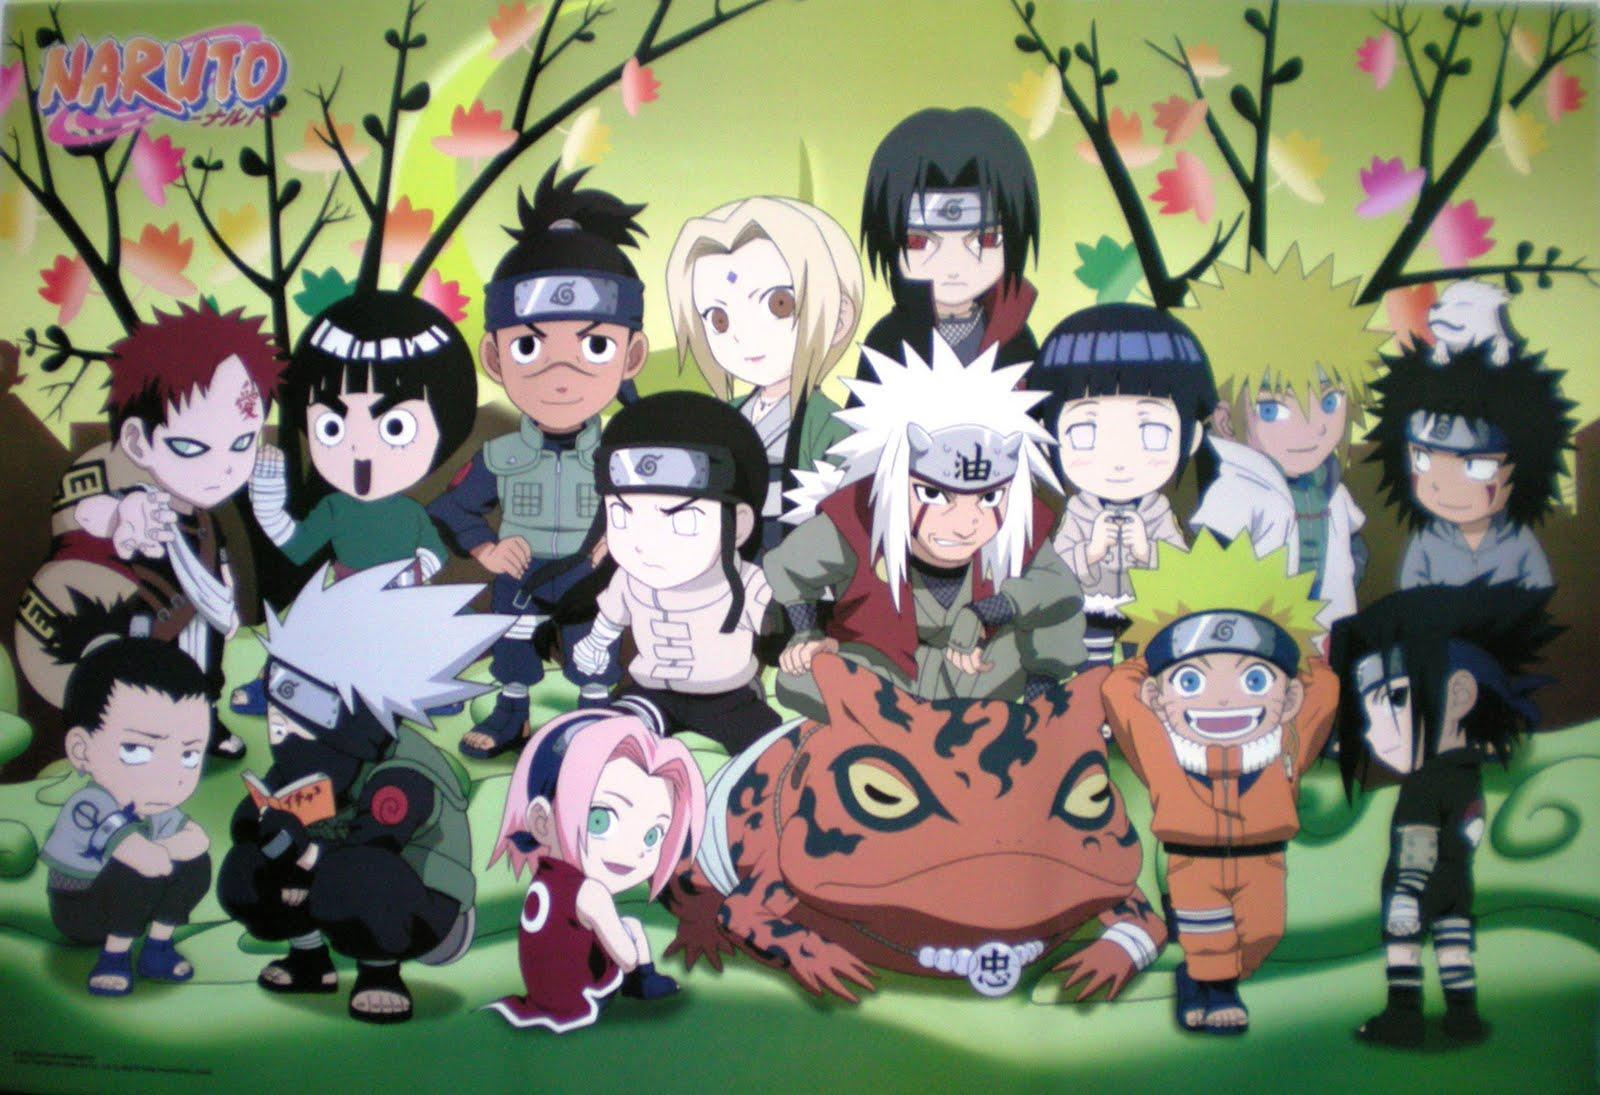 Tazangetsu Shinji Anime   Download Free Best Anime For You